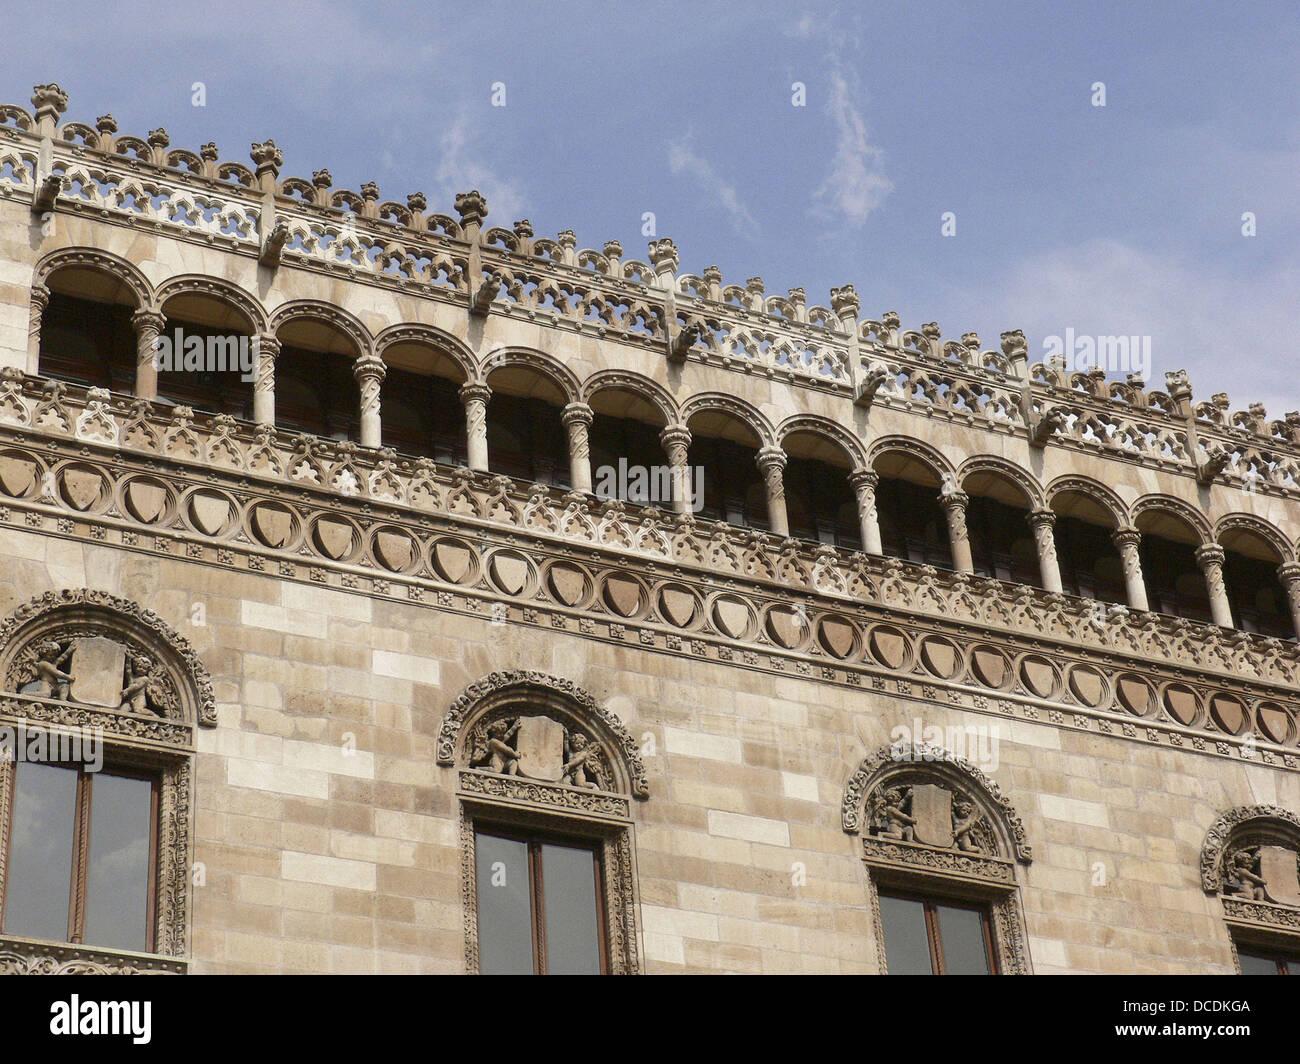 Palacio Postal. (Post Office Palace). Mexico DF. Mexico. - Stock Image